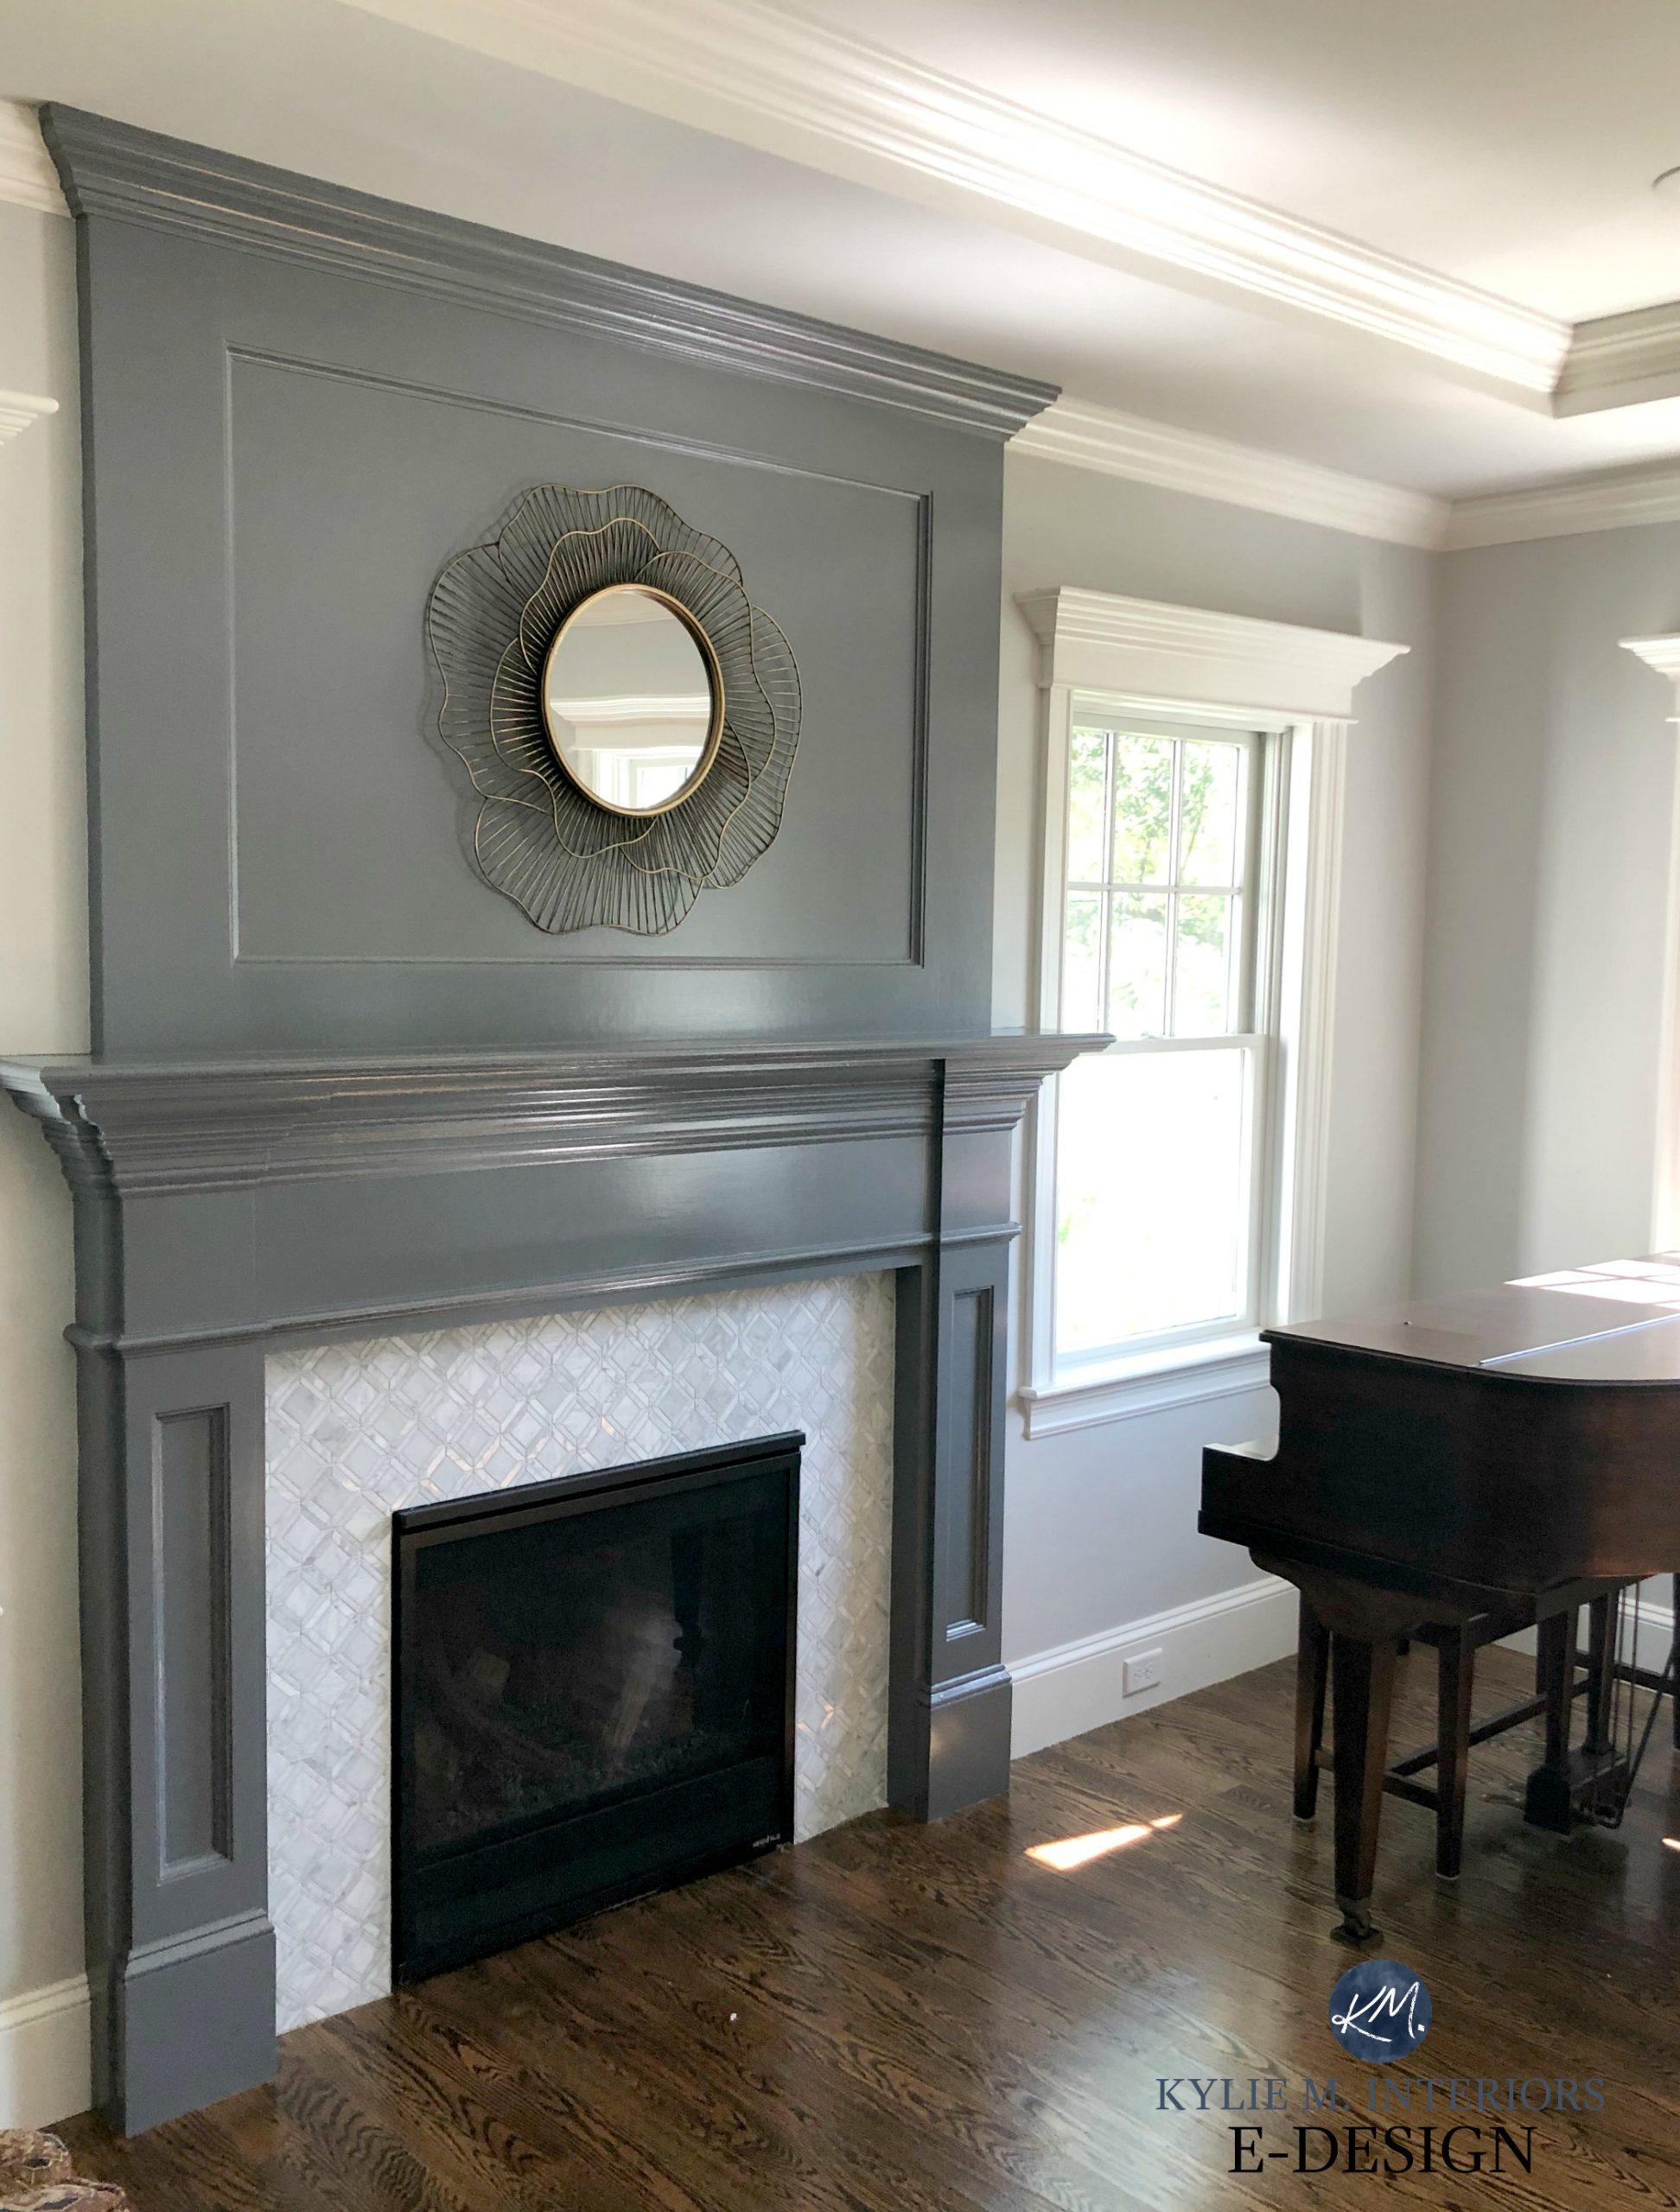 Fireplace idea marble surround and mantle painted Benjamin Moore Gray dark oak flooring, gray